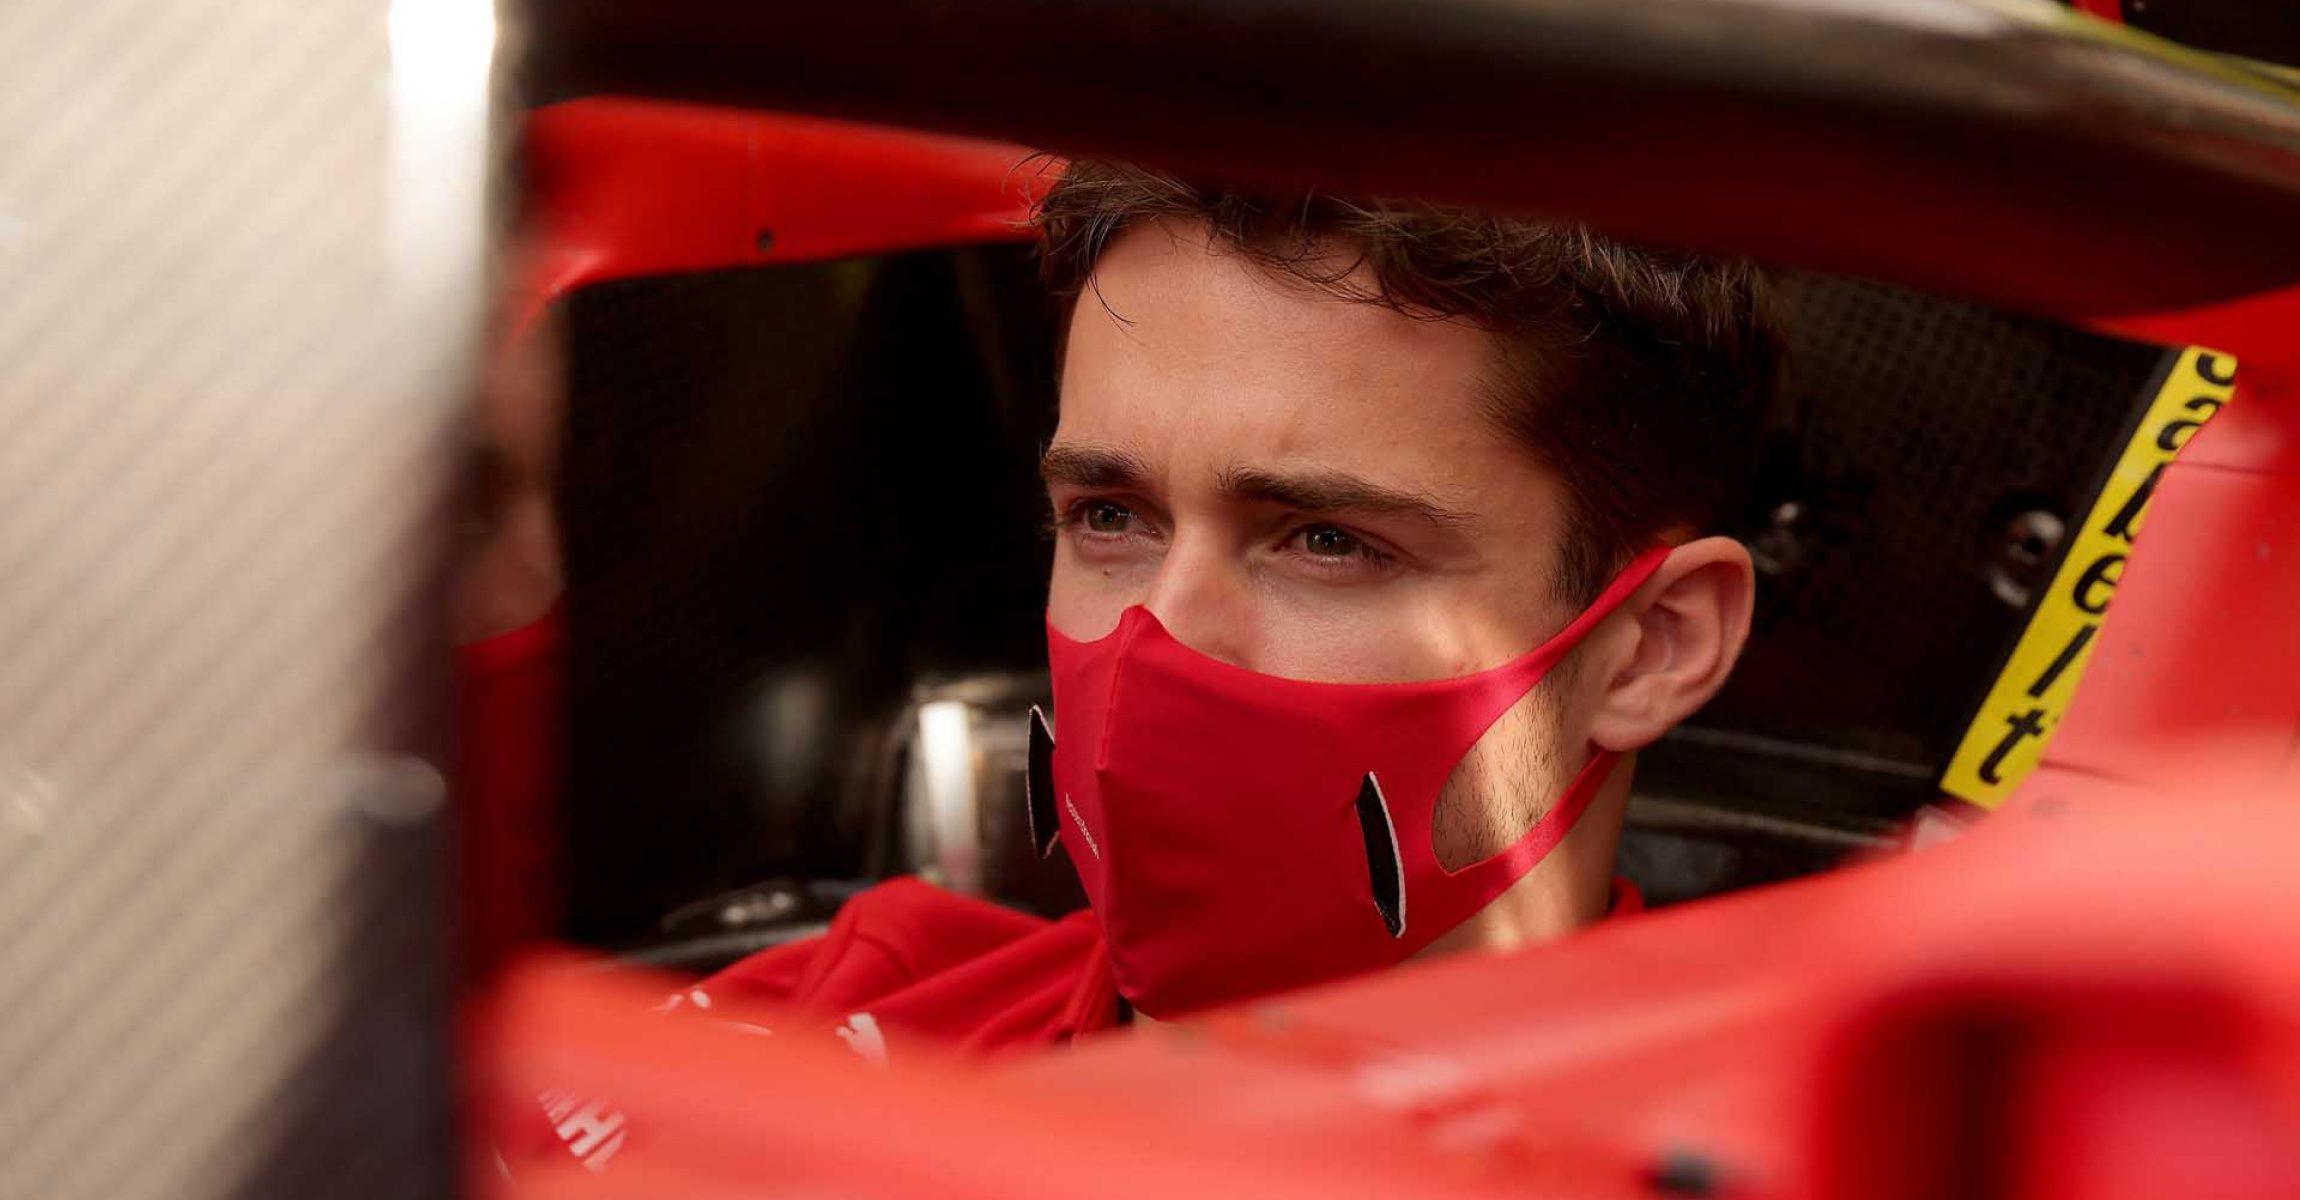 GP SAKHIR  F1/2020 - GIOVEDÌ 03/12/2020      credit: @Scuderia Ferrari Press Office Charles Leclerc